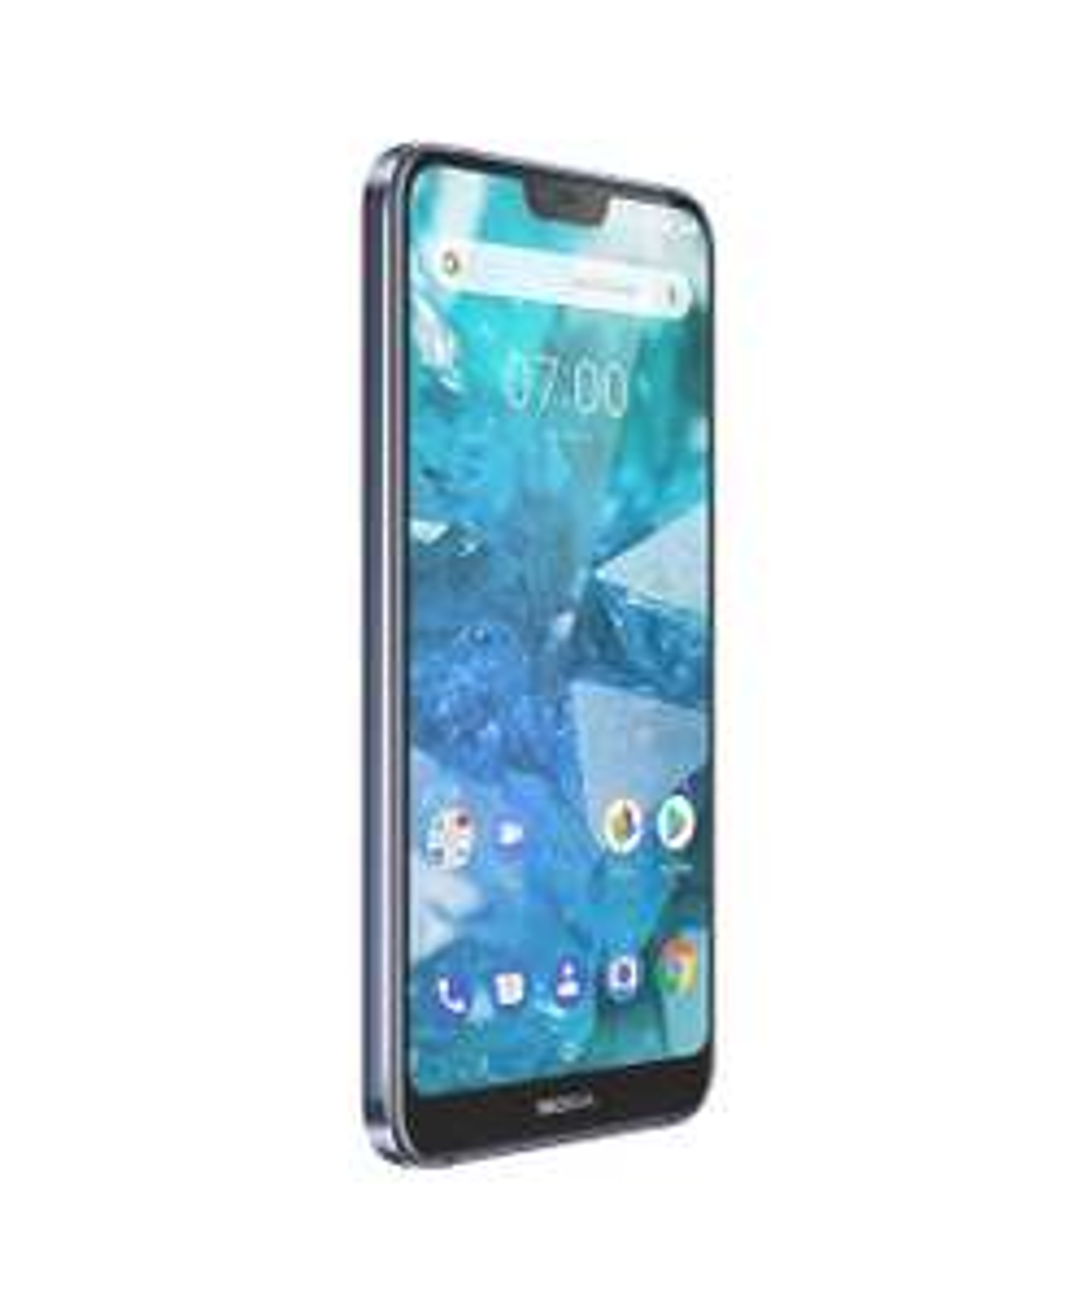 [Amazon] Nokia 7.1, 32 GB Speicher, 3 GB RAM, Dual Sim, Blau, inkl. Walther Schlüsselbundlampe, blau